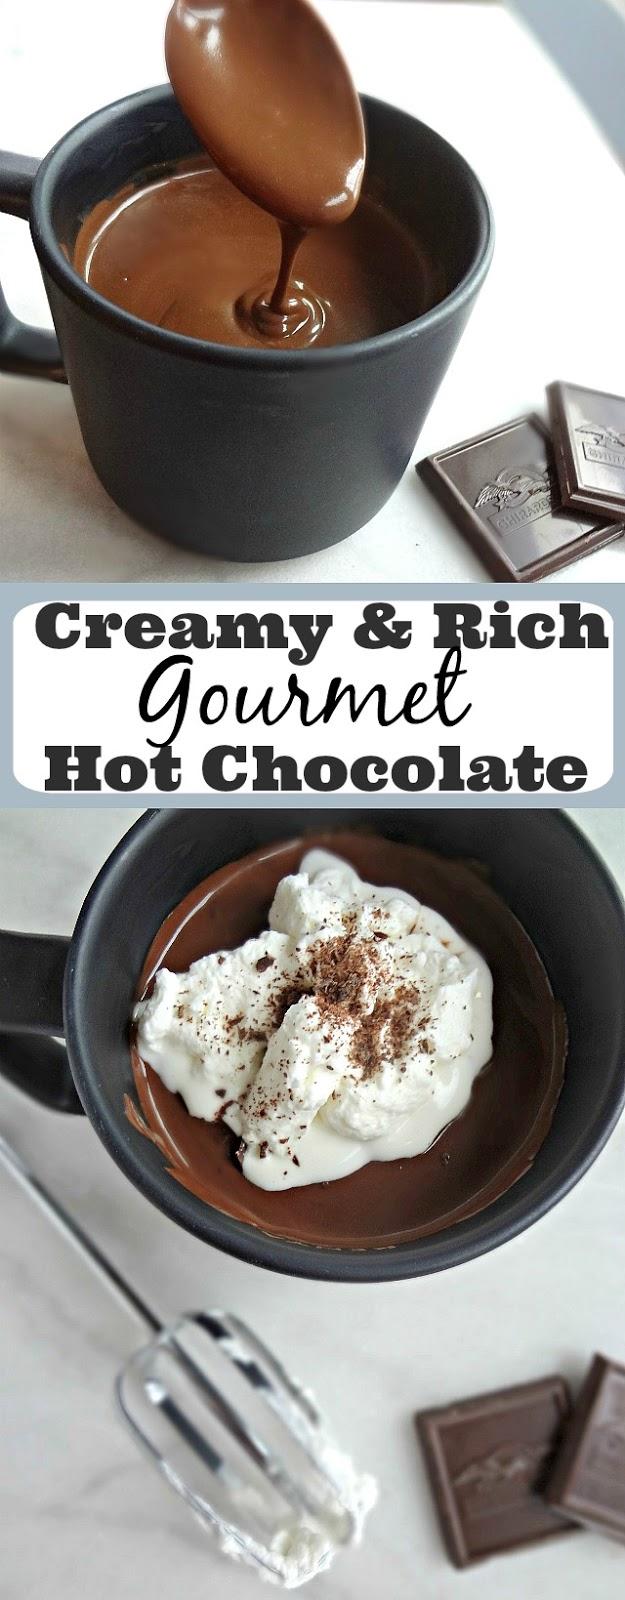 Creamy & Rich Gourmet Hot Chocolate